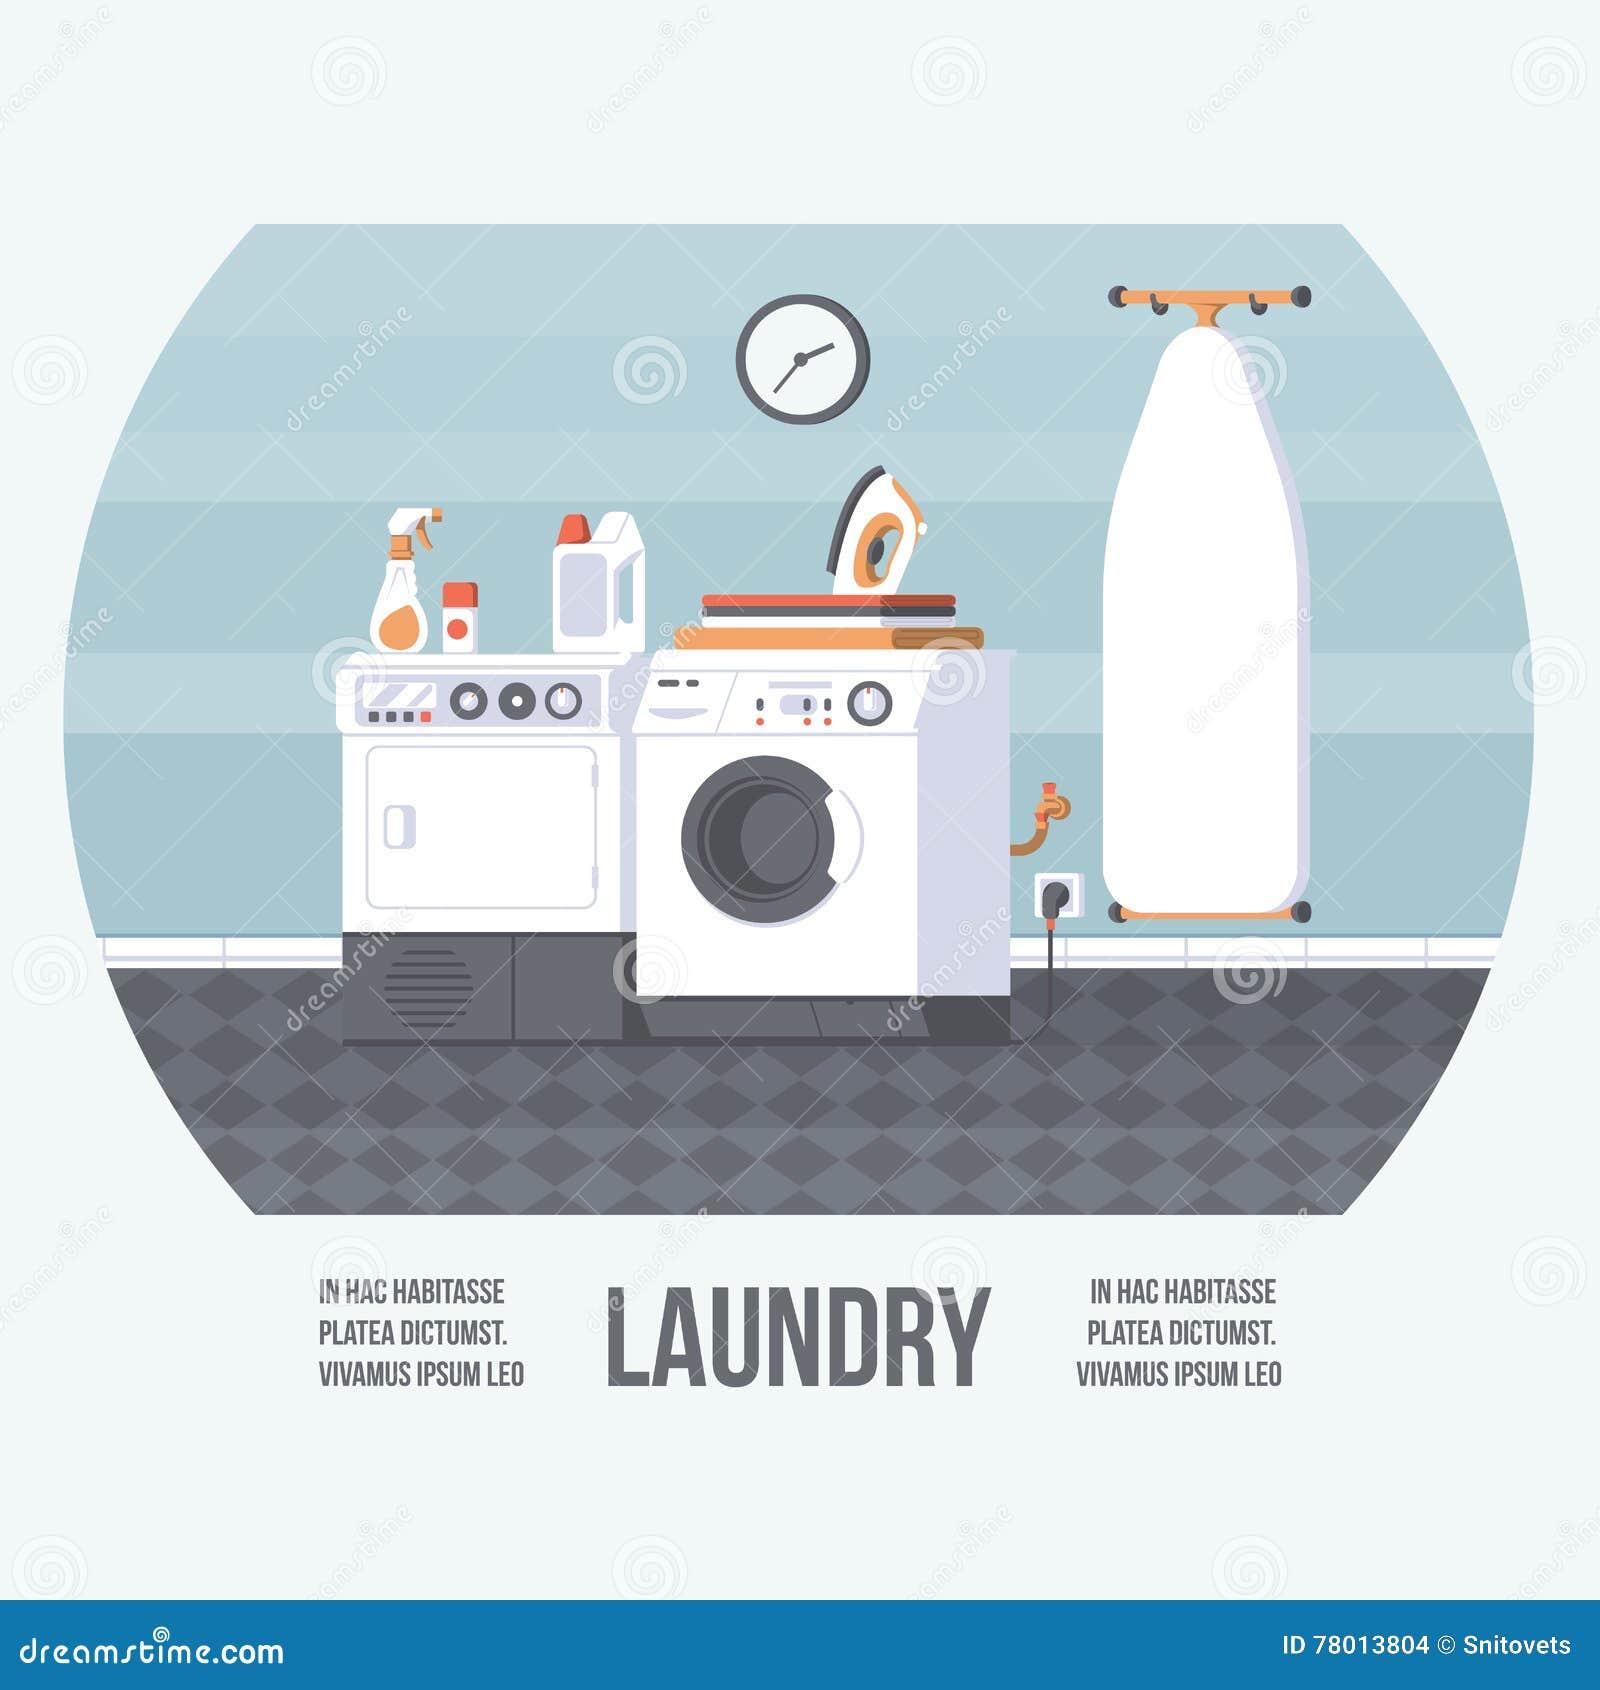 Laundry Elements Set Washer And Dryer Detergents Basket